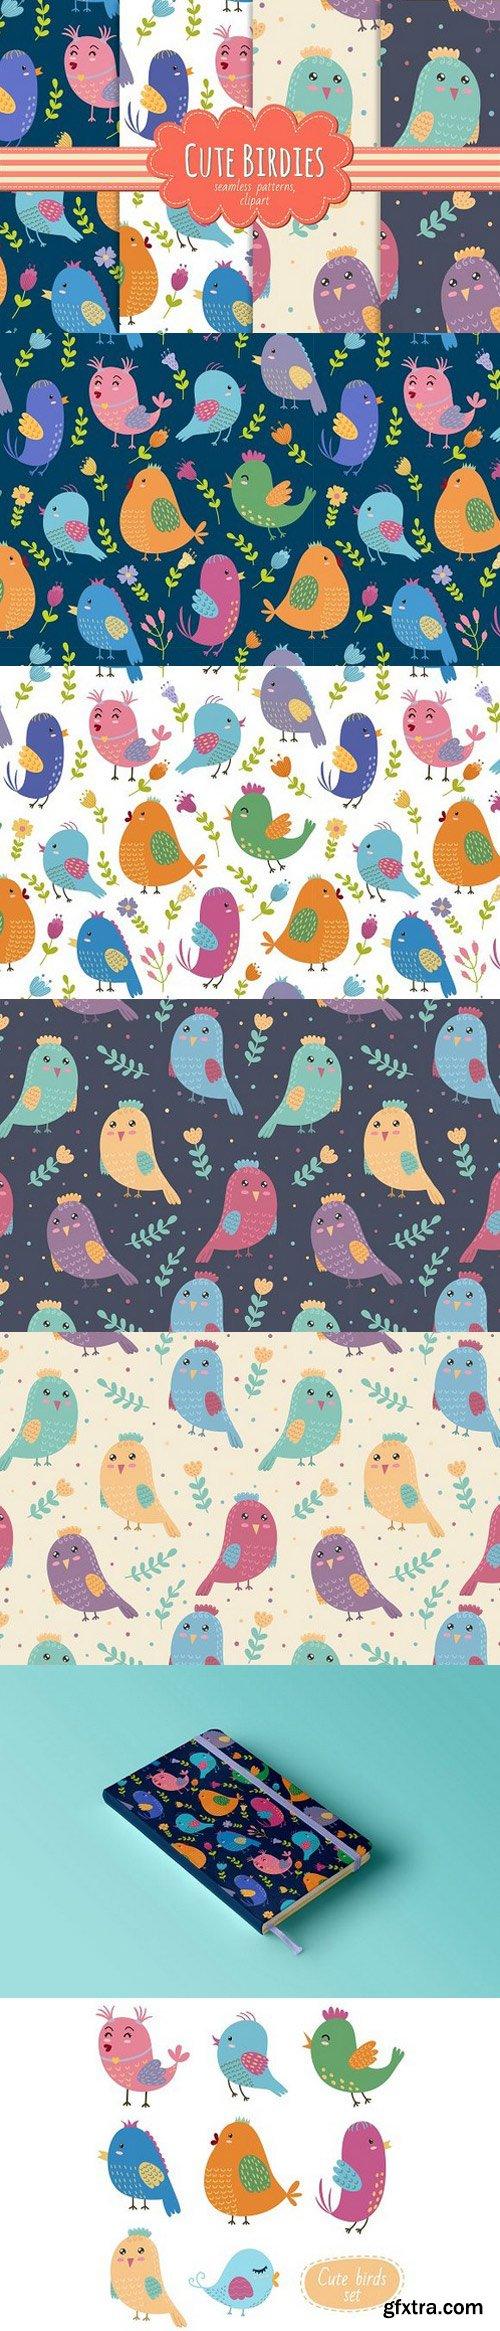 Cute Birdies patterns&clipart